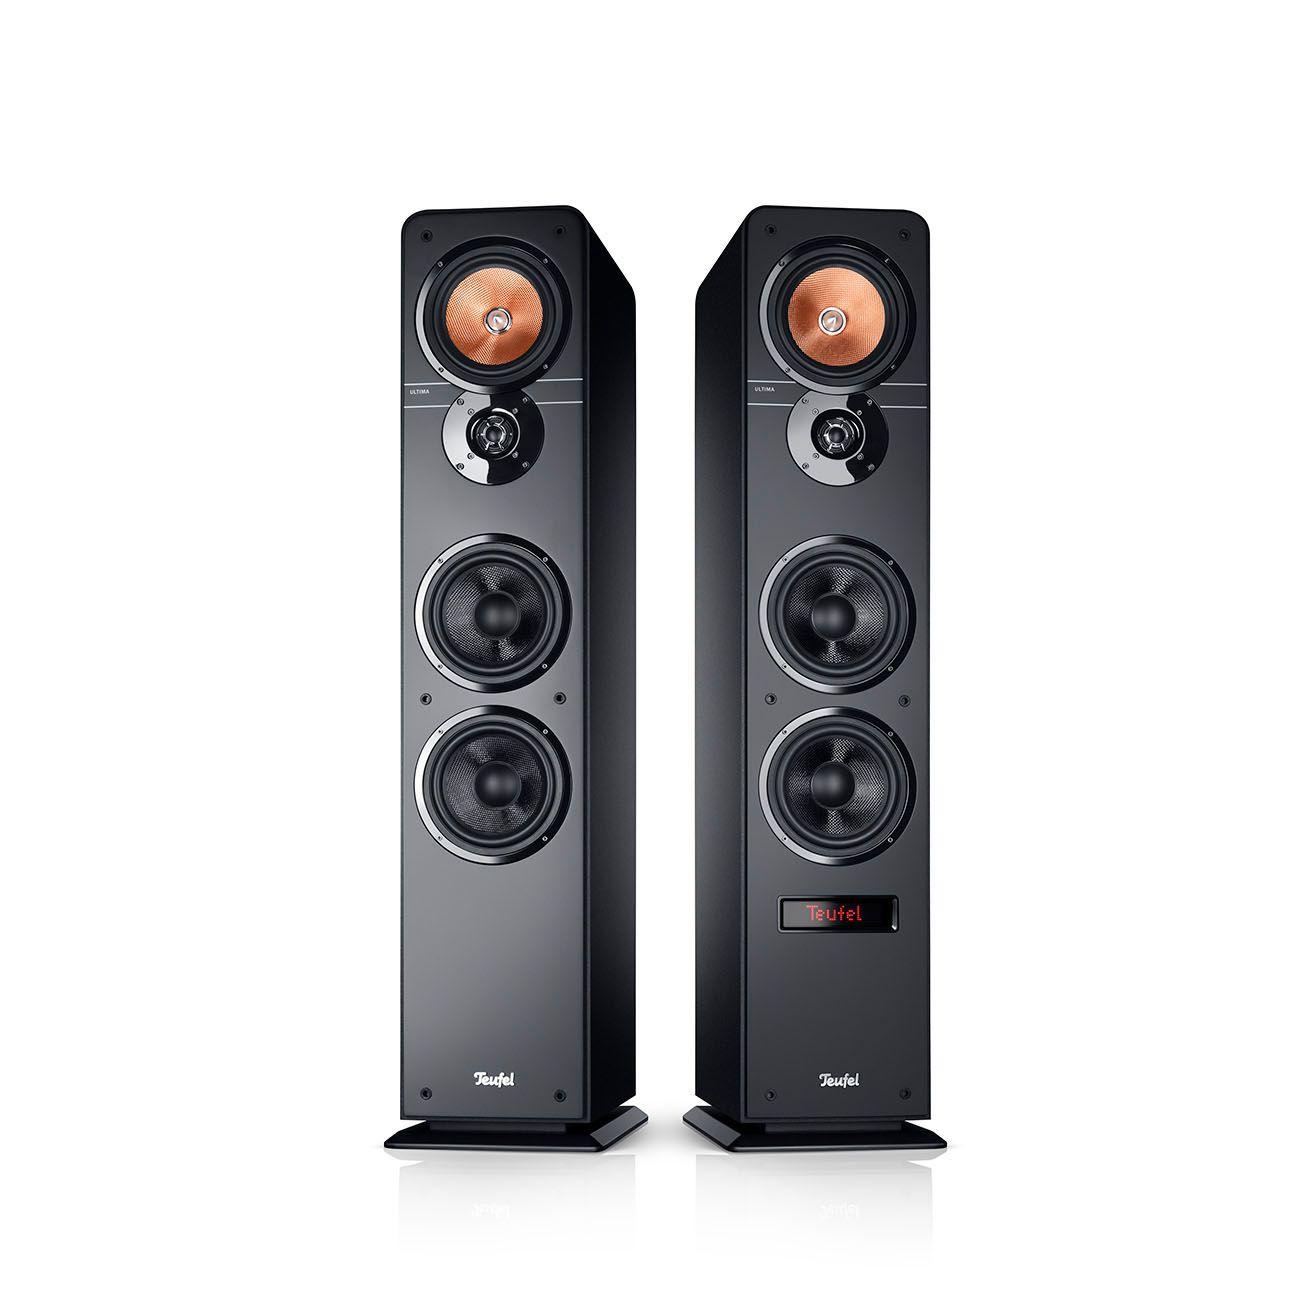 ultima 40 aktiv   lautsprecher, teufel audio und stereo